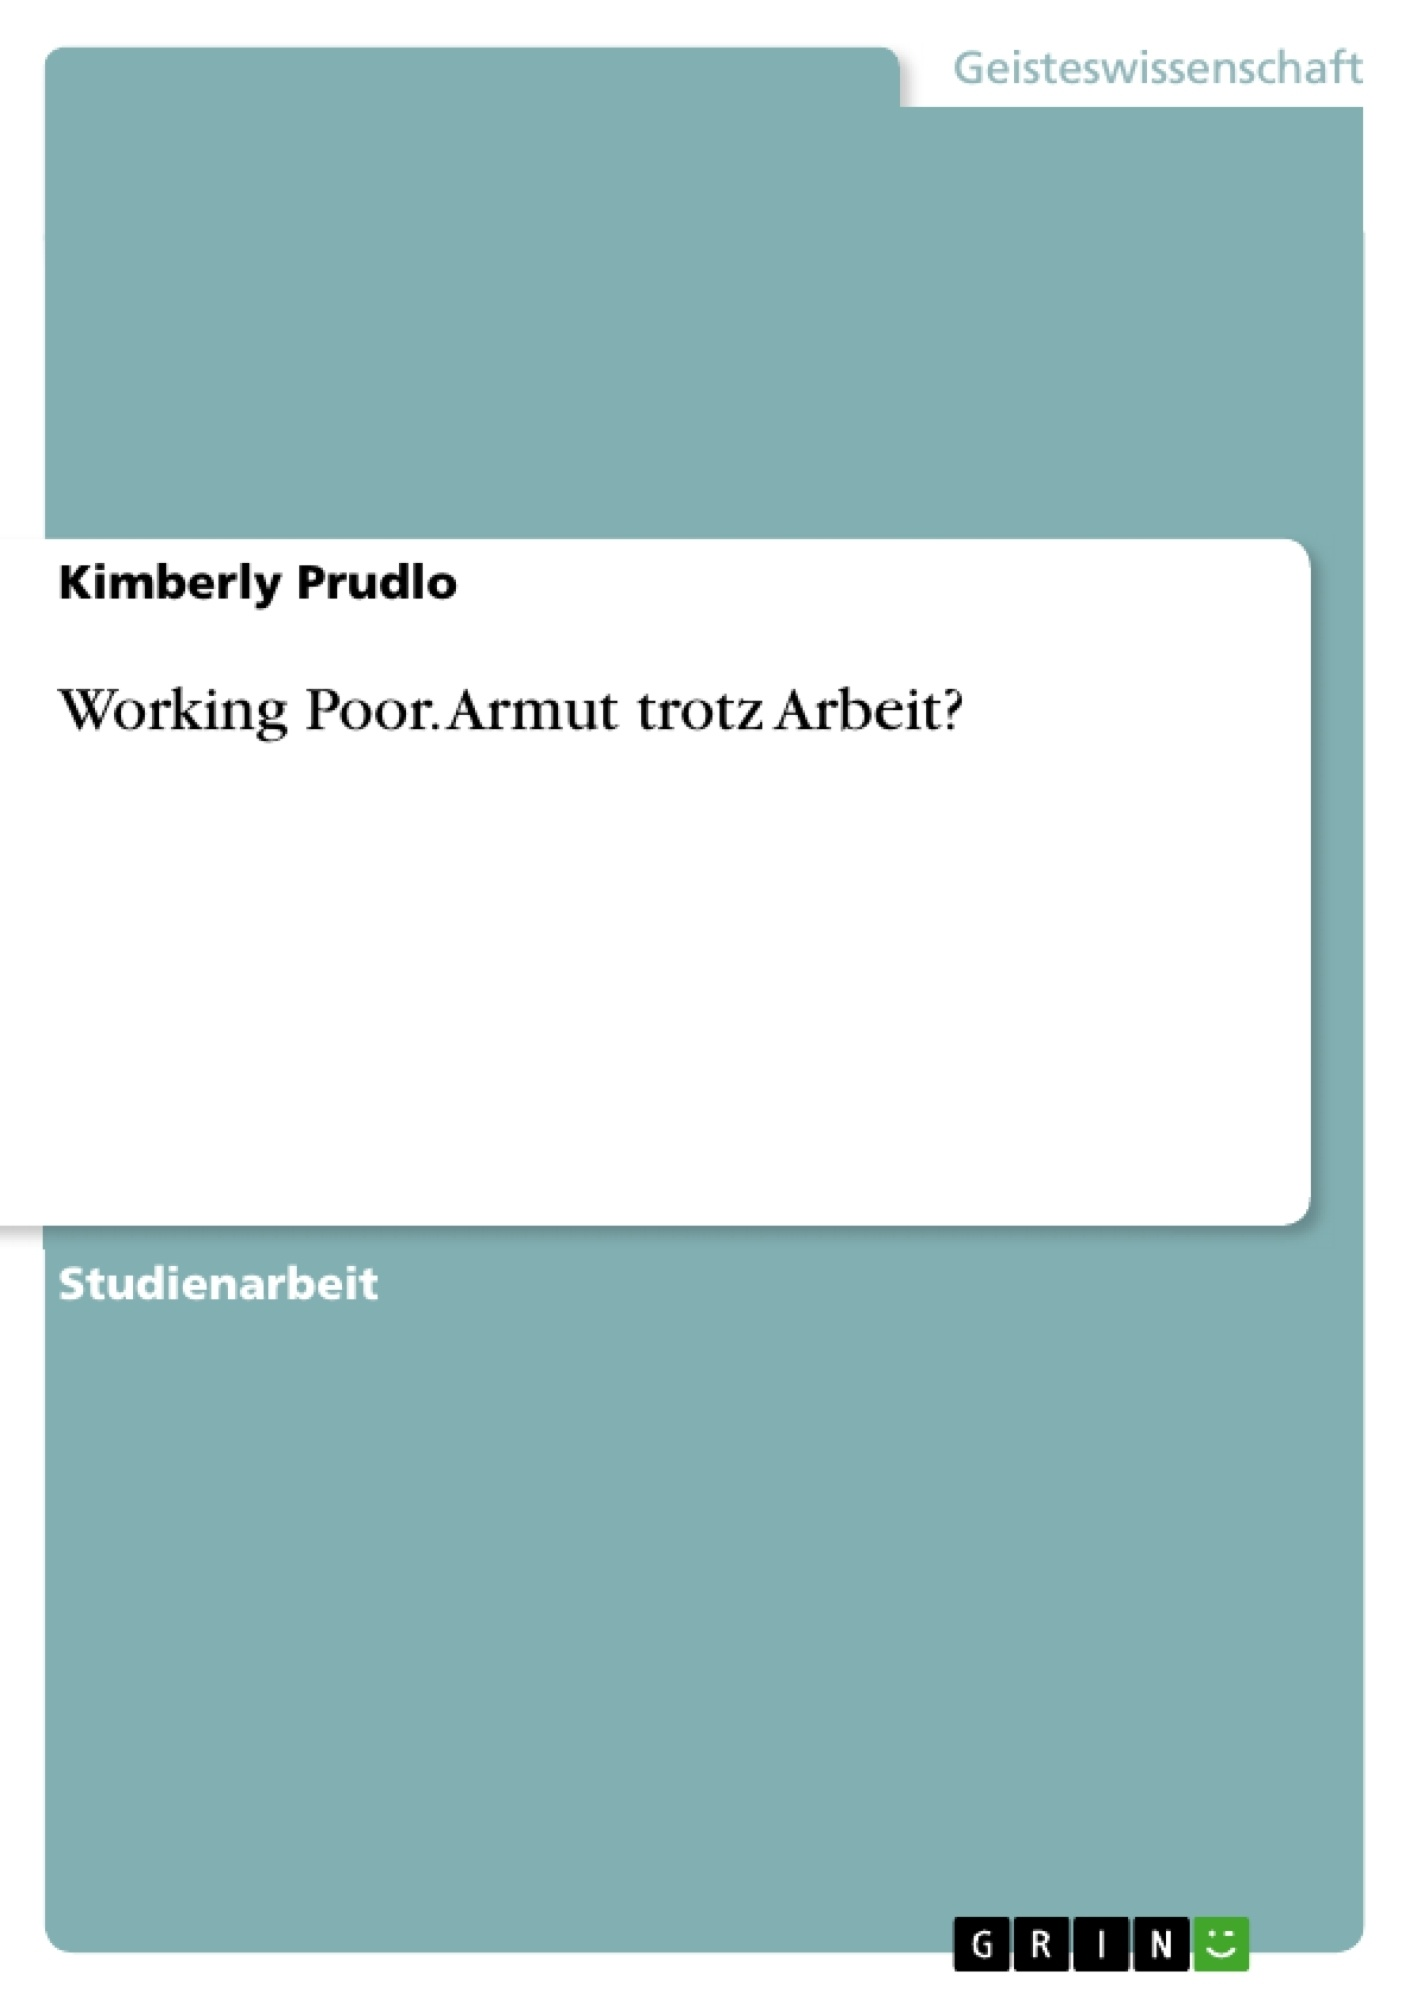 Titel: Working Poor. Armut trotz Arbeit?